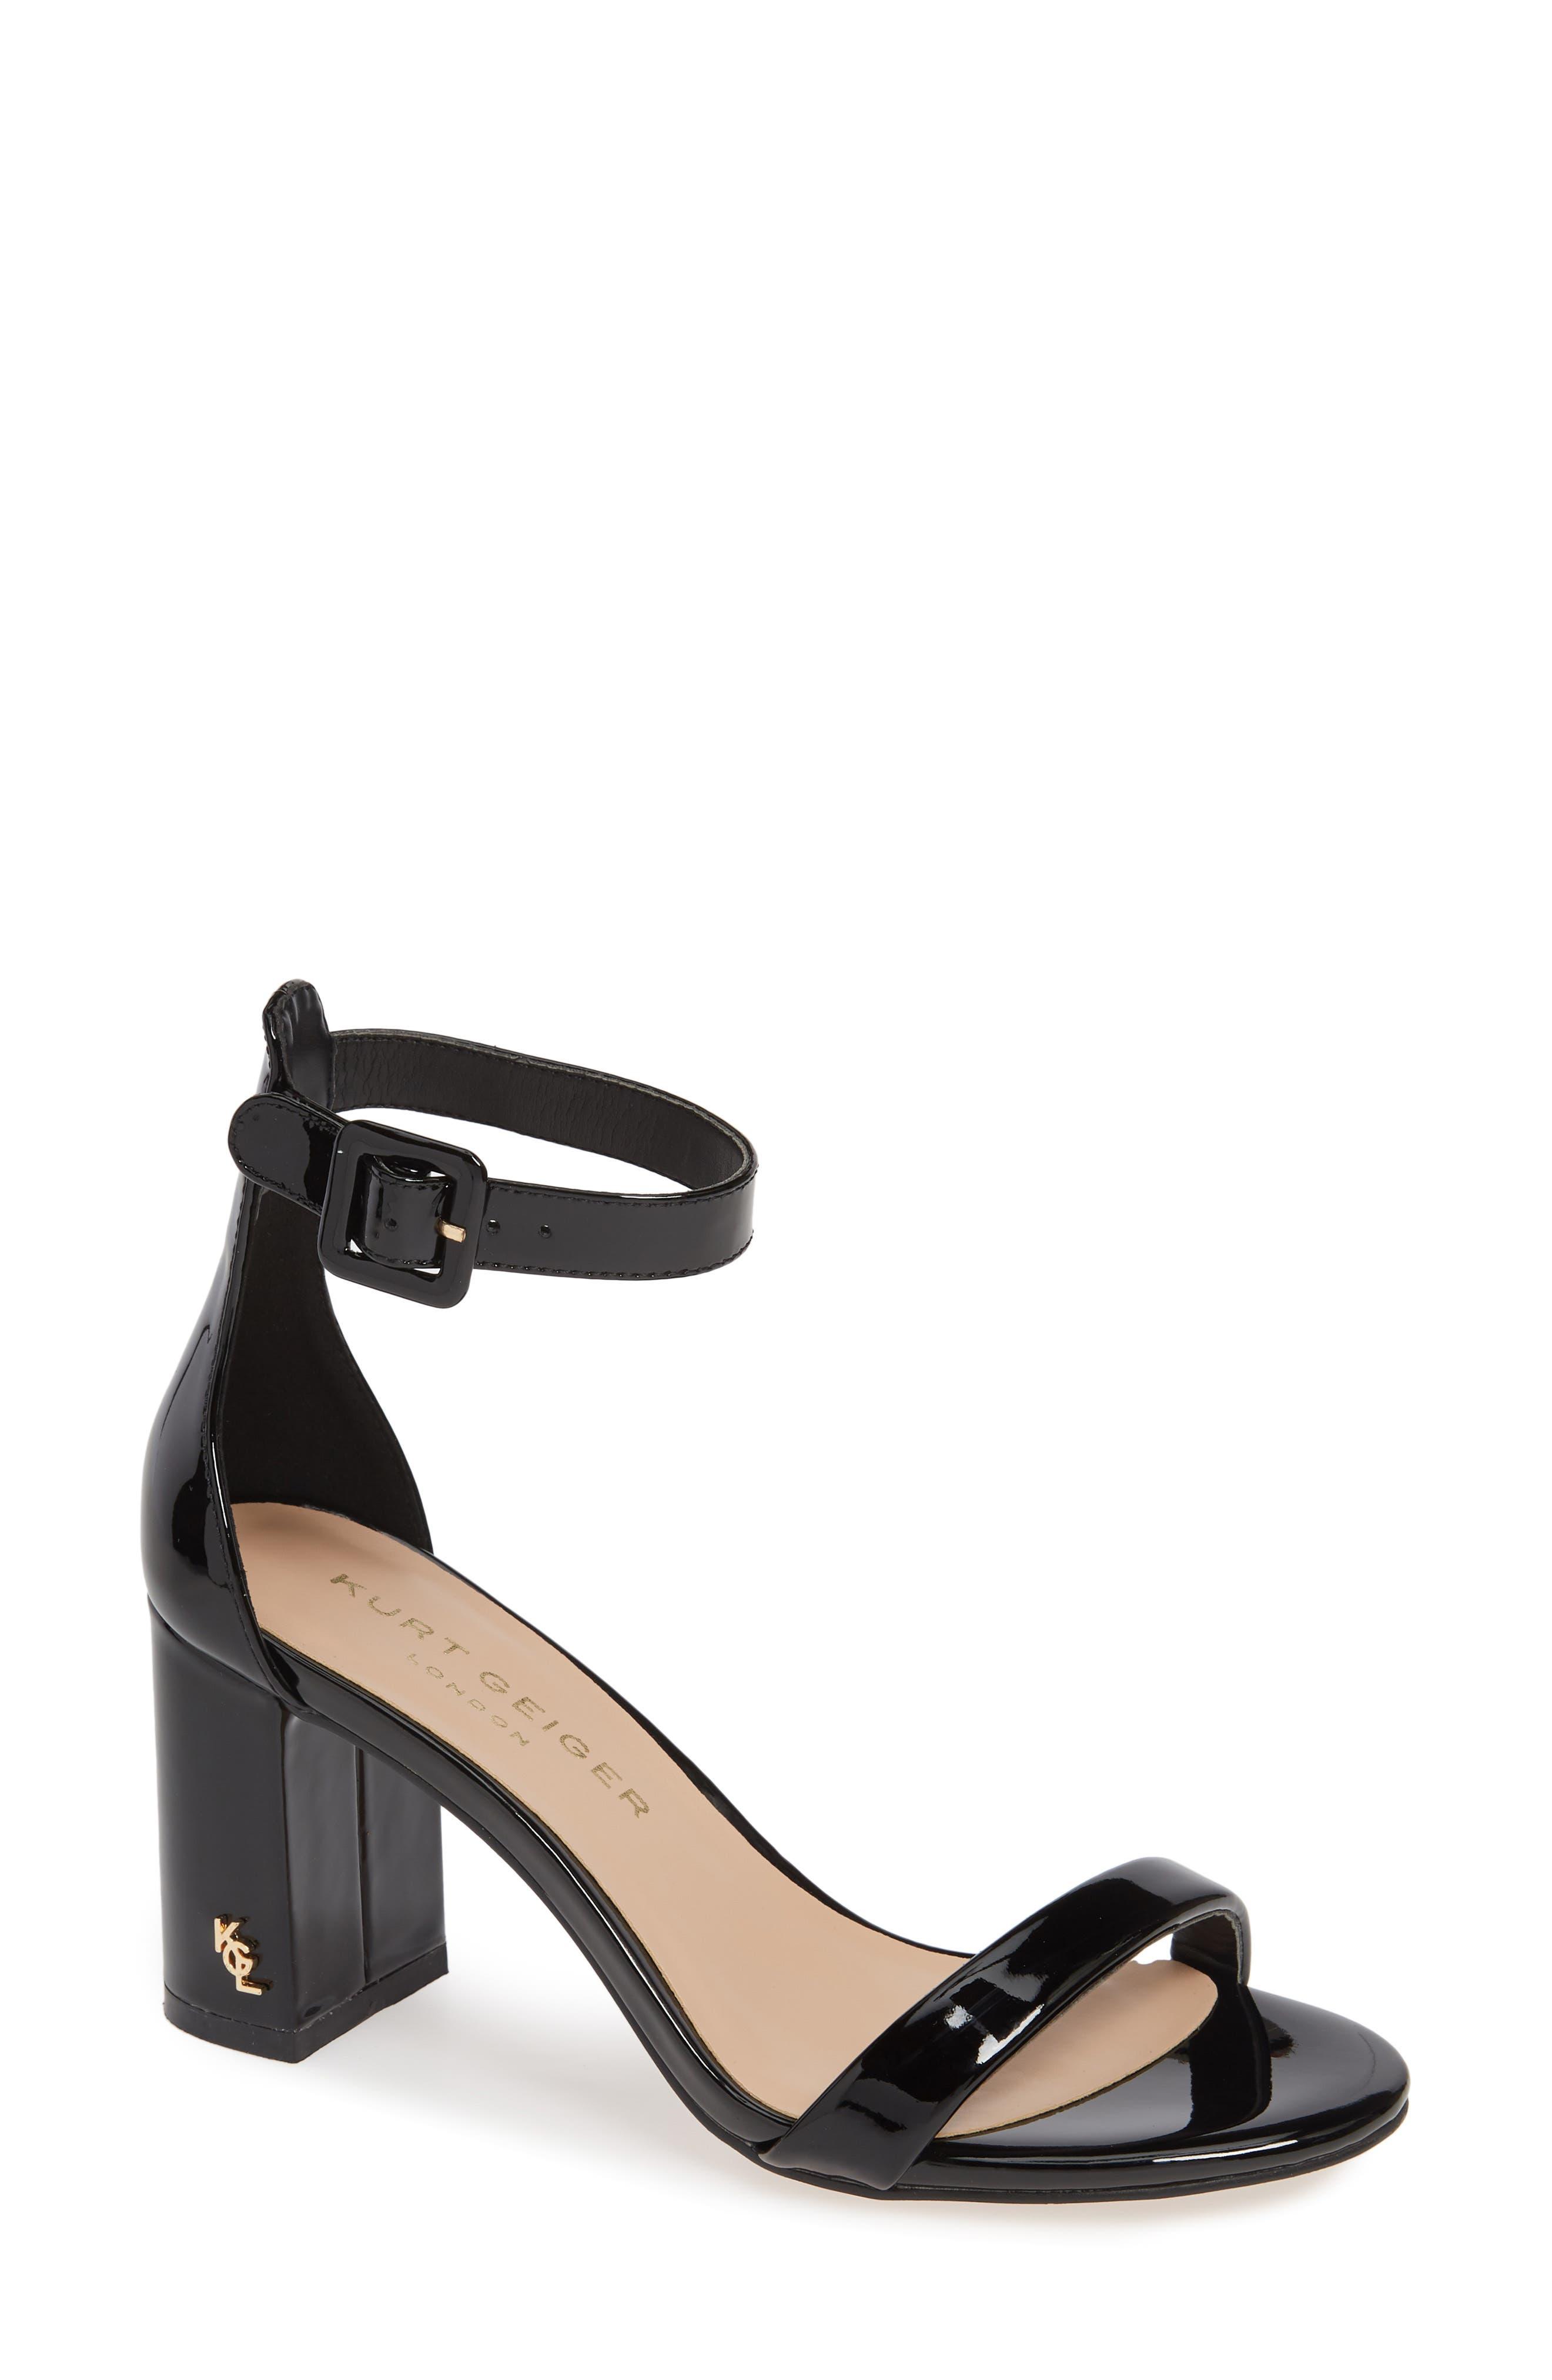 Langley Ankle Strap Sandal, Main, color, BLACK LEATHER